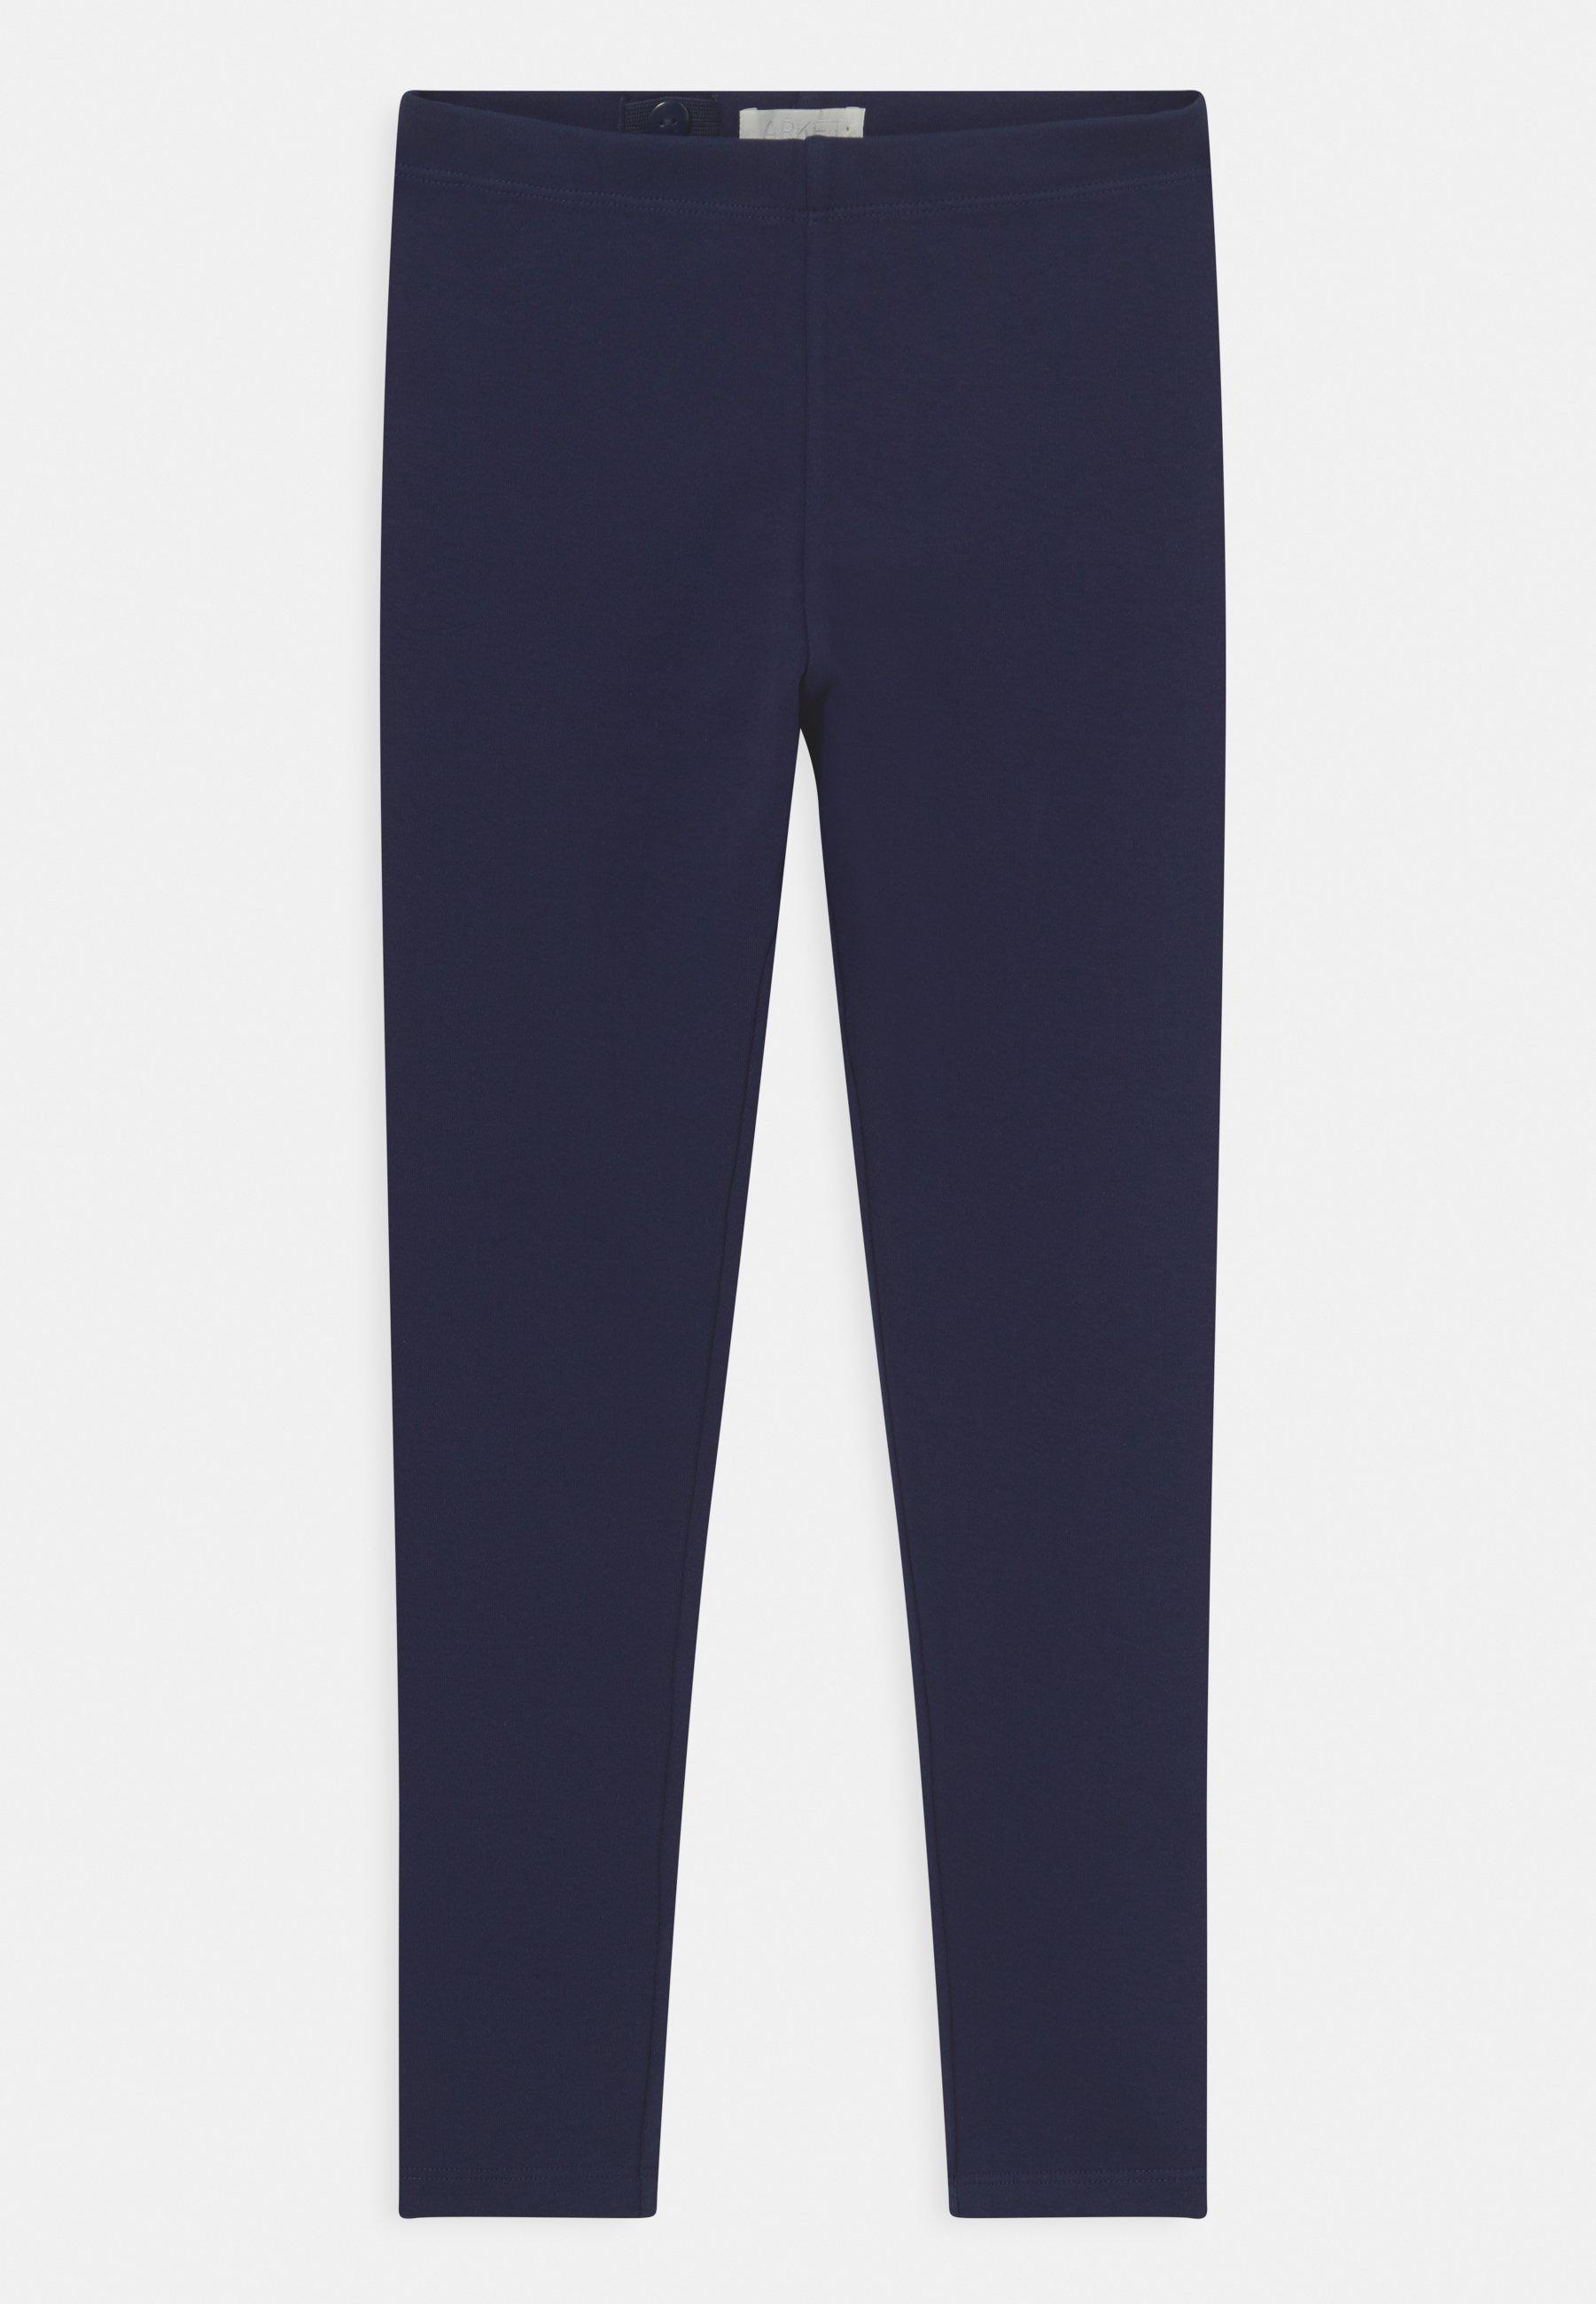 Kids Leggings - Trousers